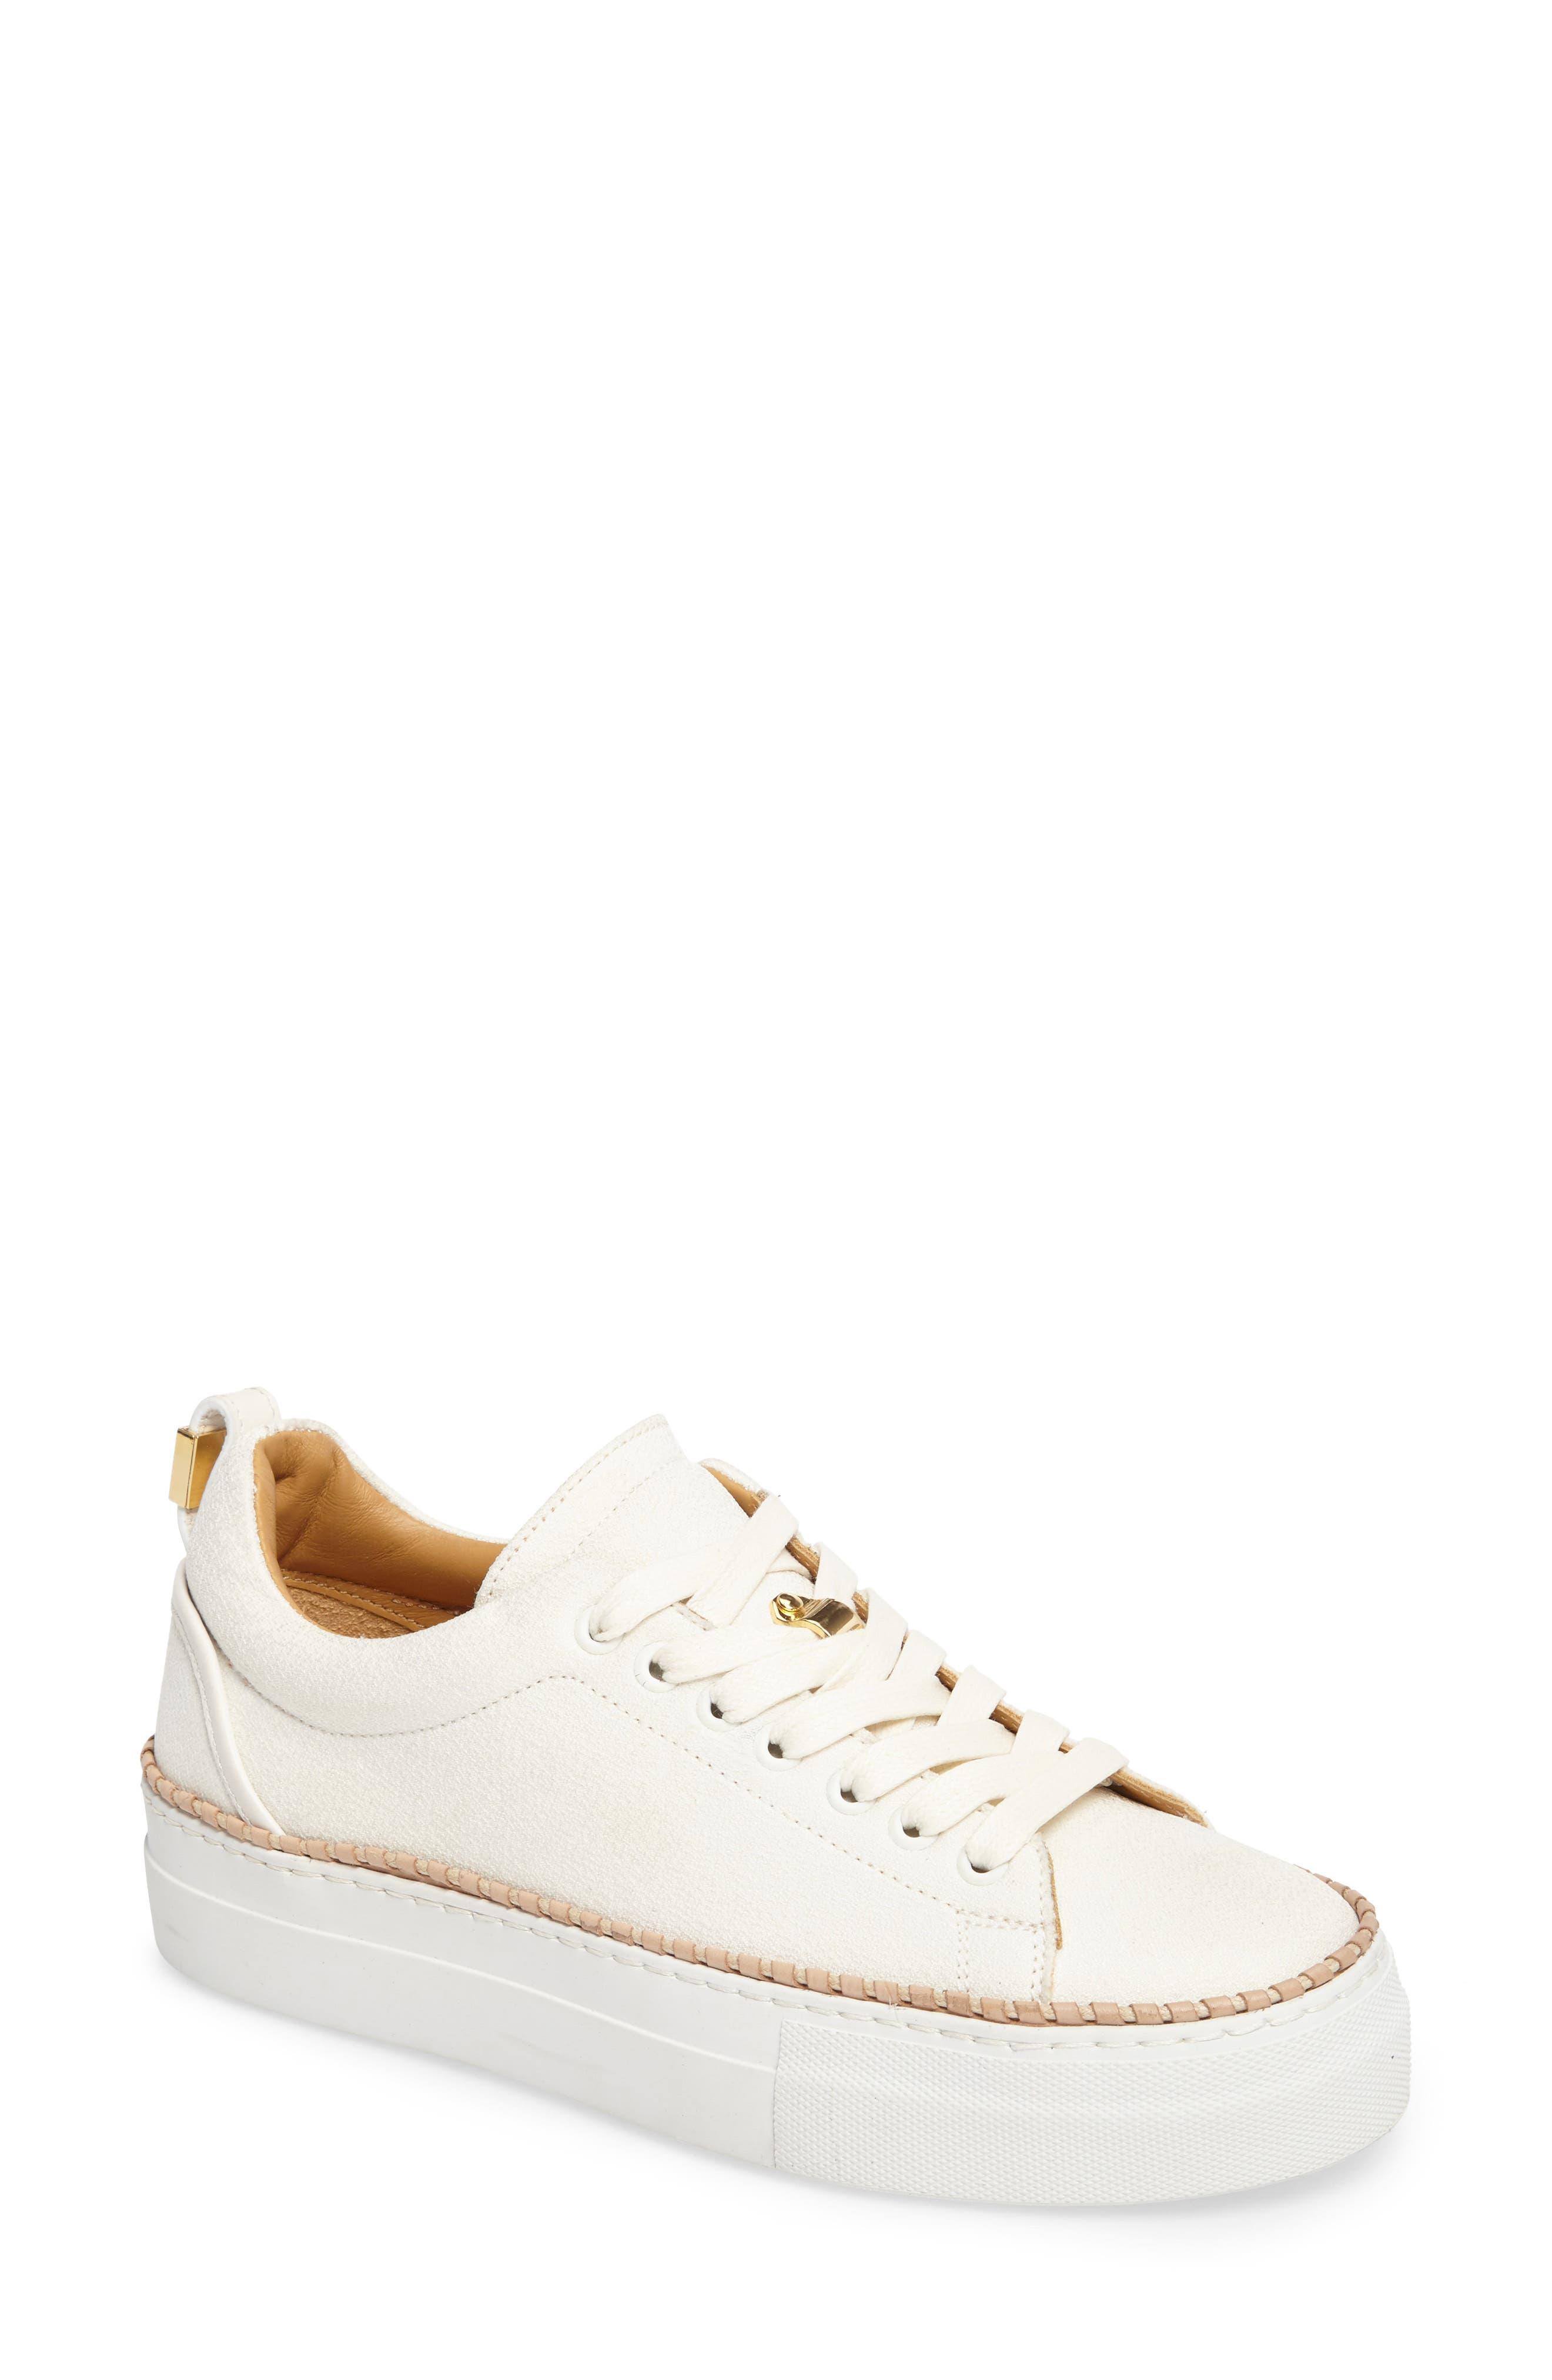 Tennis Crepone Sneaker,                         Main,                         color, 900